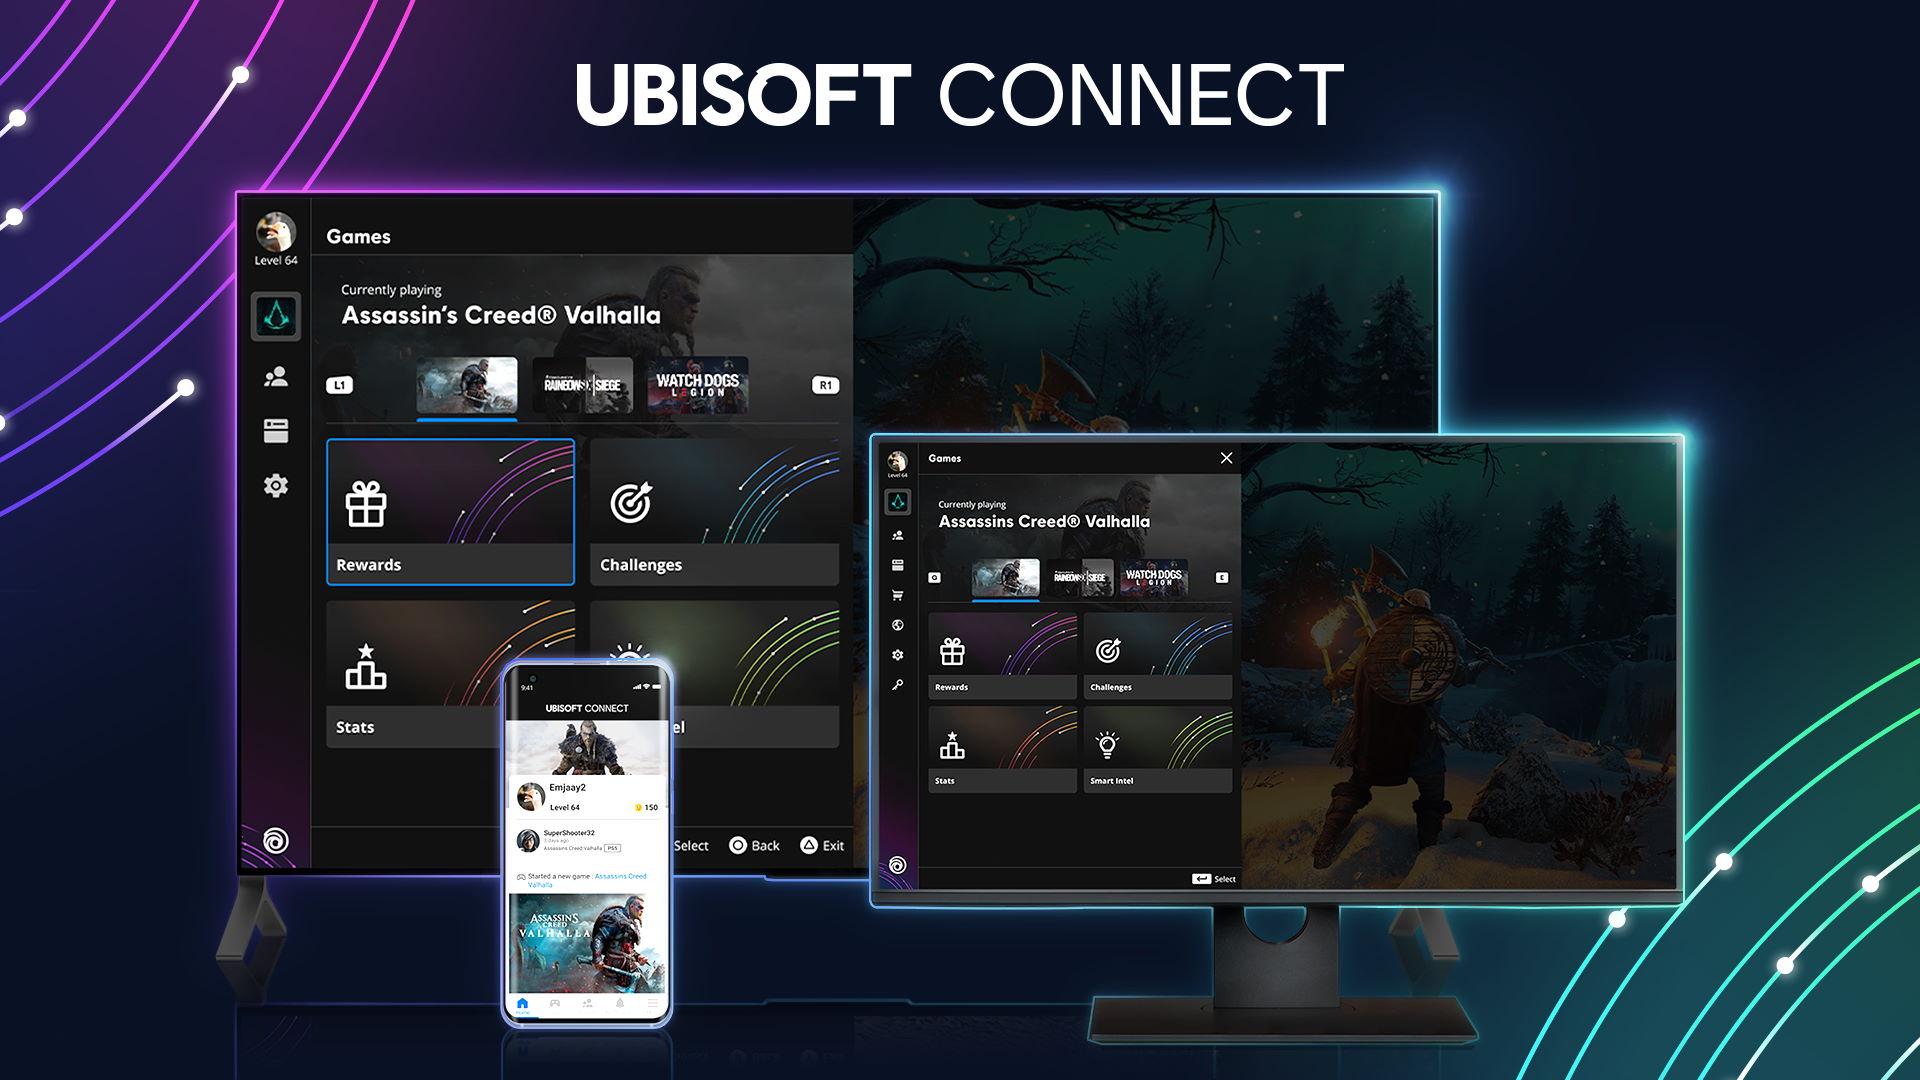 ubisoft-connect-cross-play-cross-progression.jpg